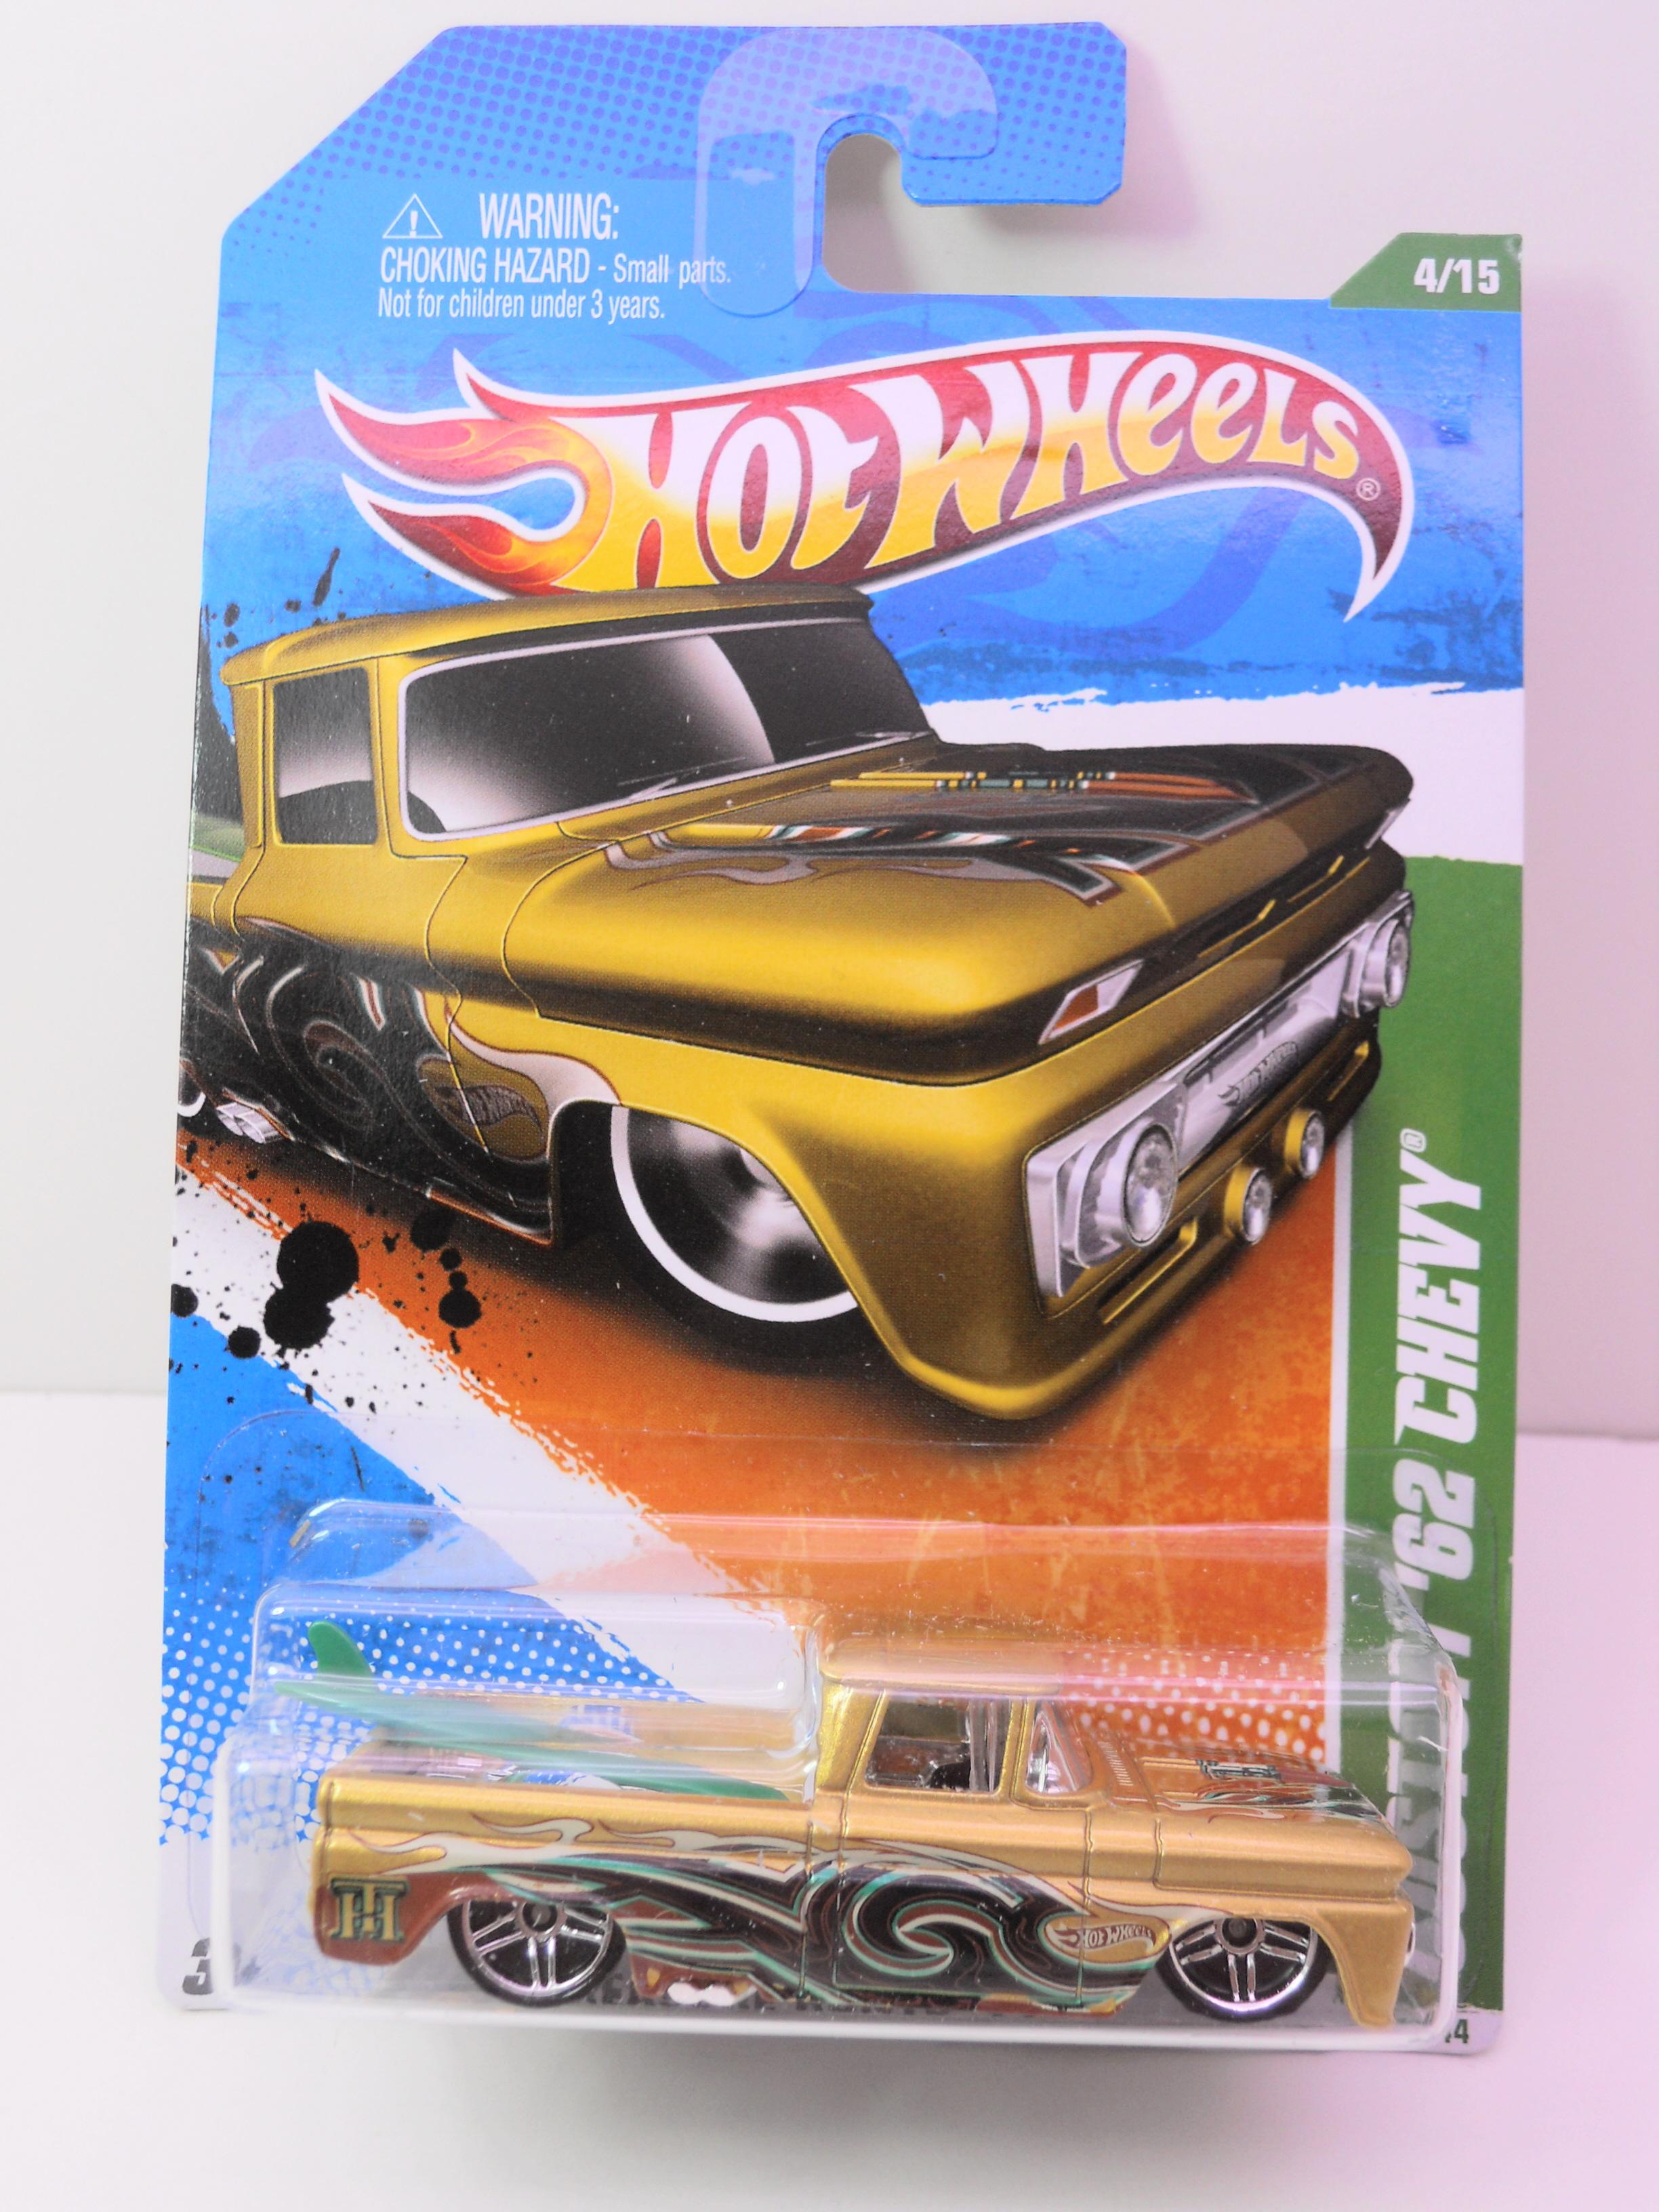 2013 Hot Wheels Treasure Hunt Ebay Electronics Cars .html | Autos ...